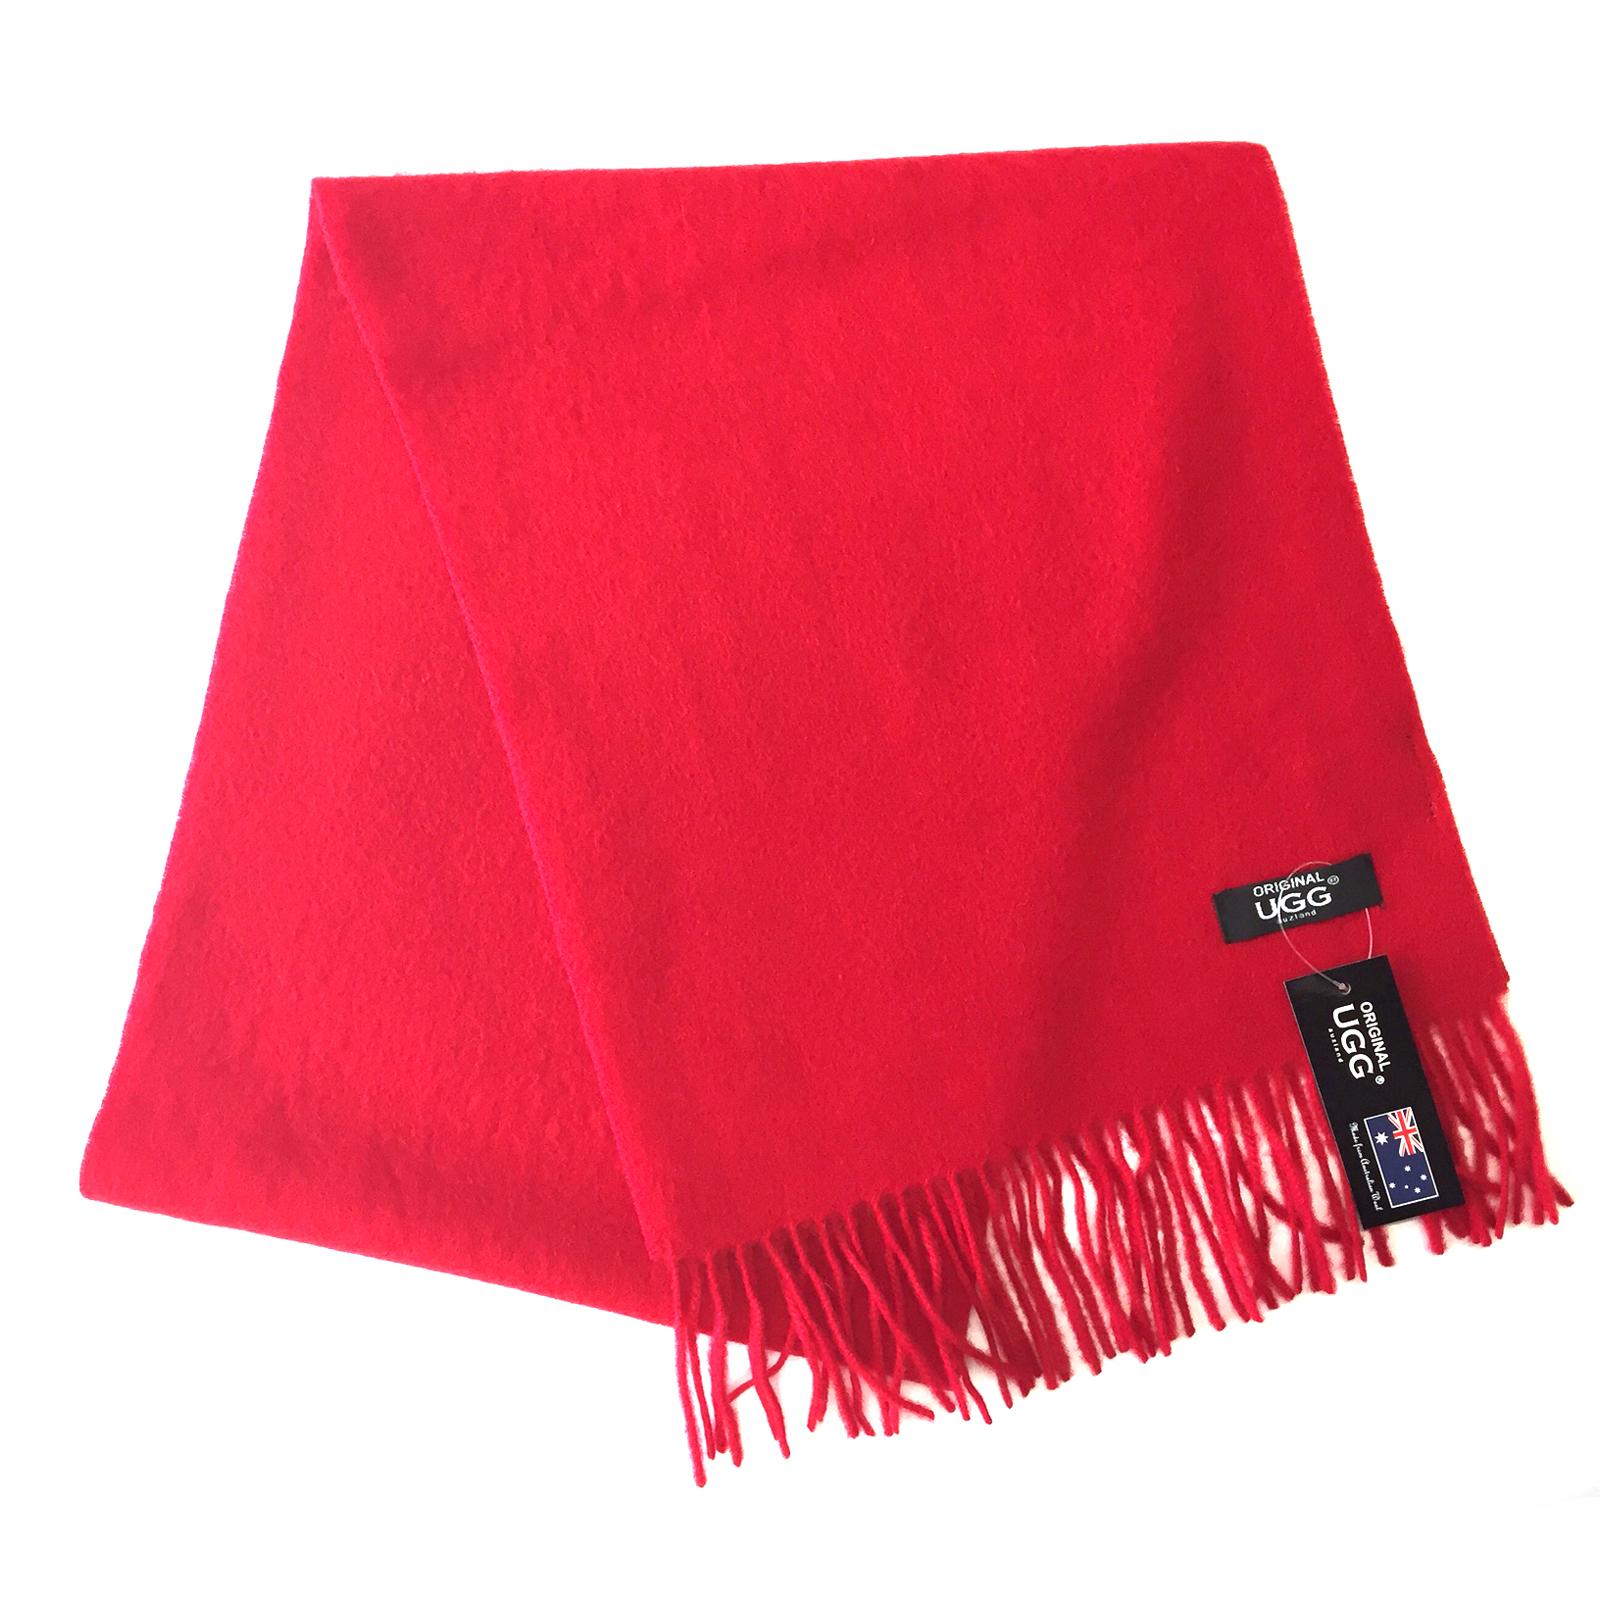 original ugg scarf